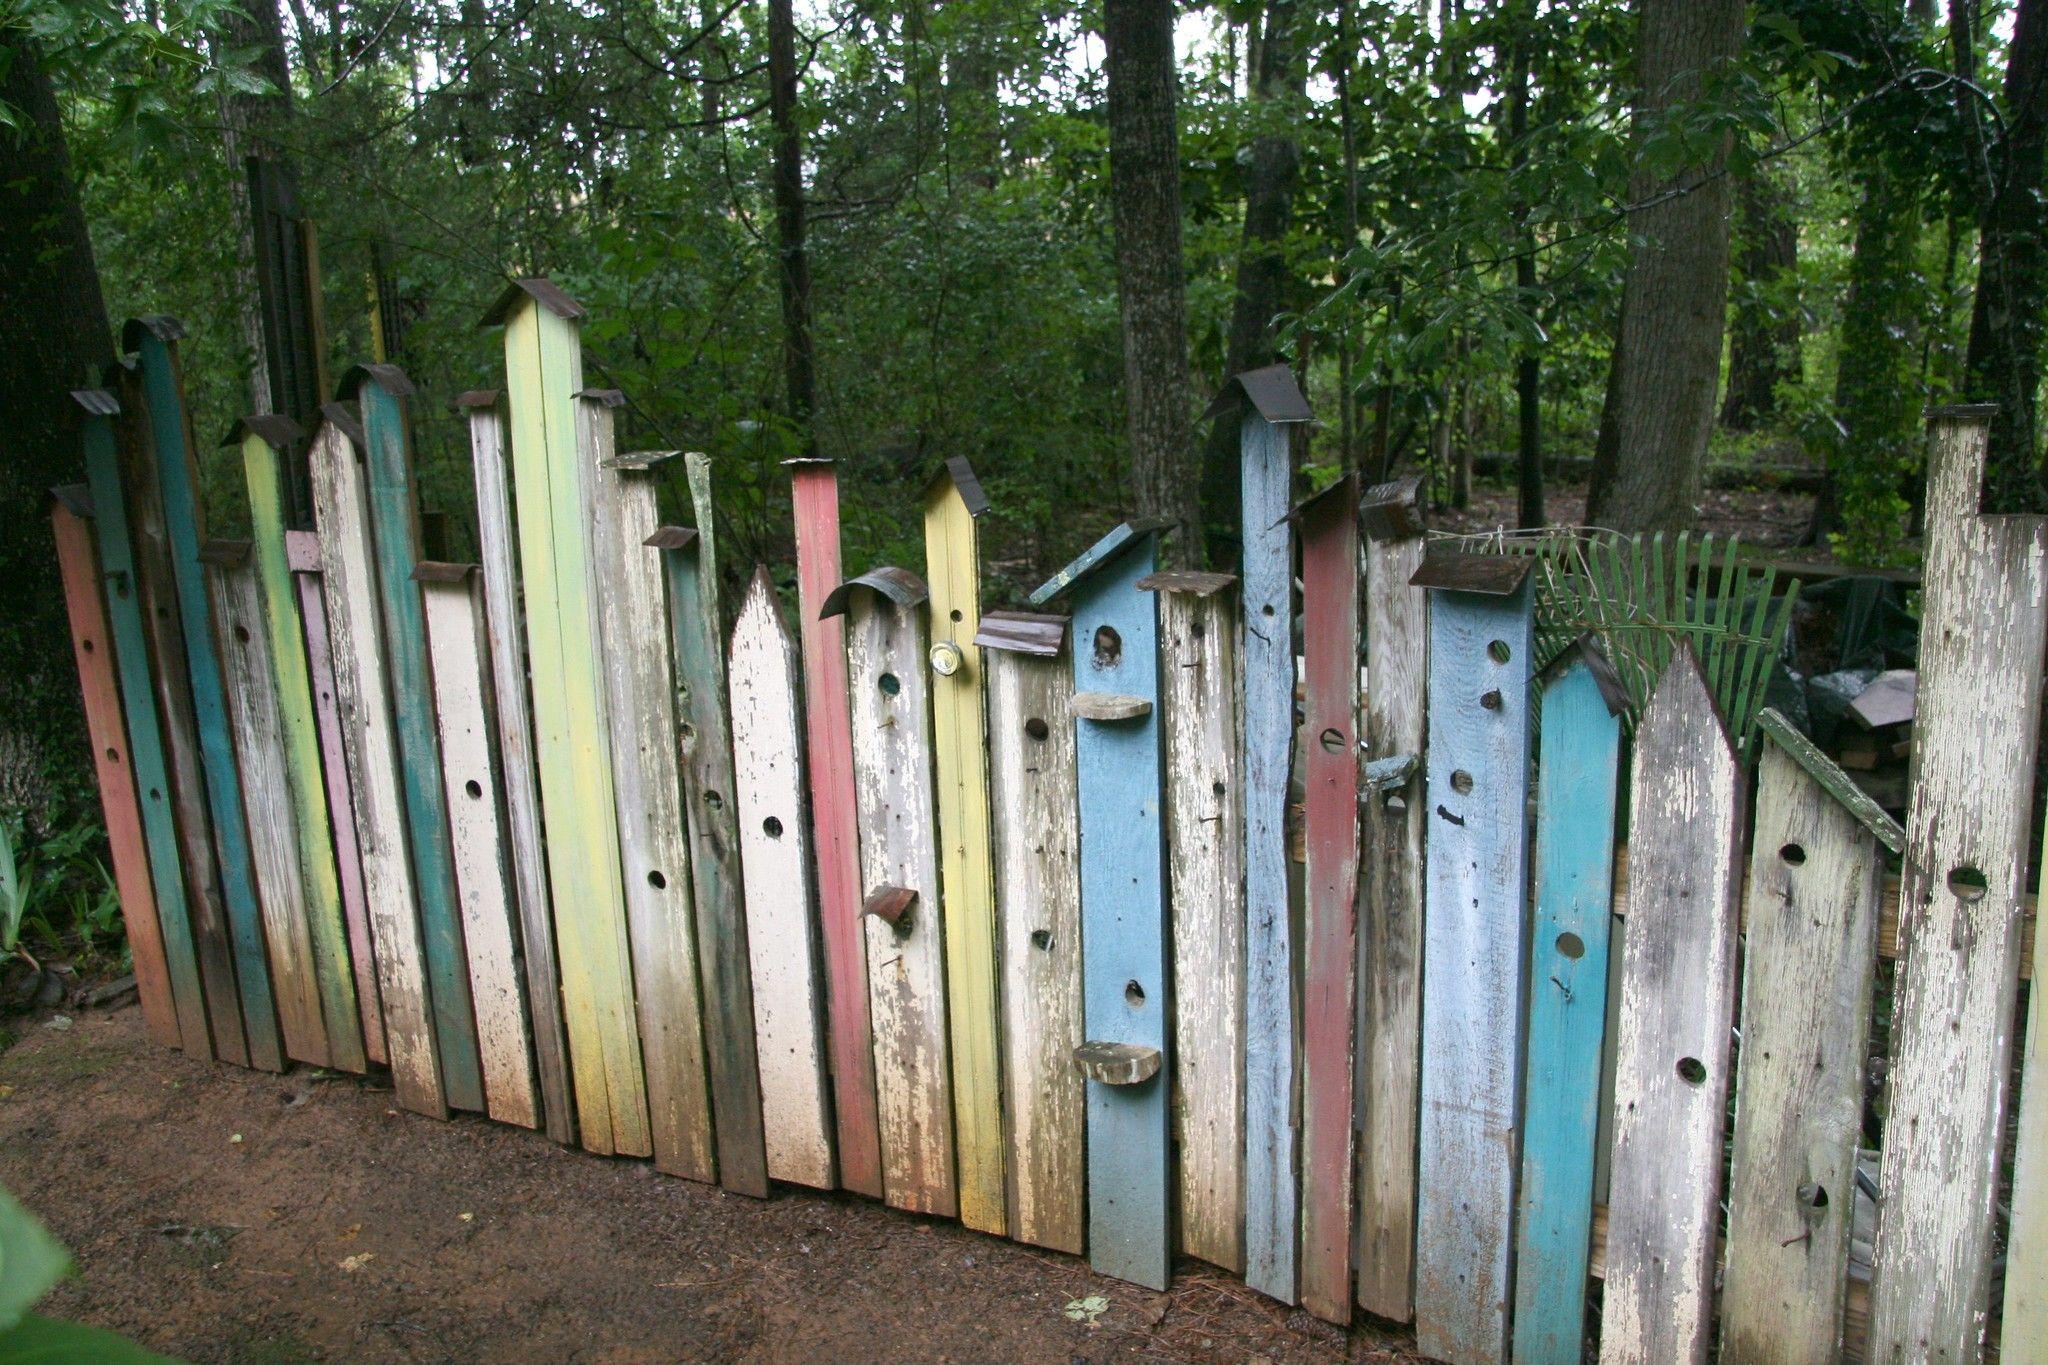 Birdhouse Fence In 2020 Bird Houses Garden Fencing Fence Design